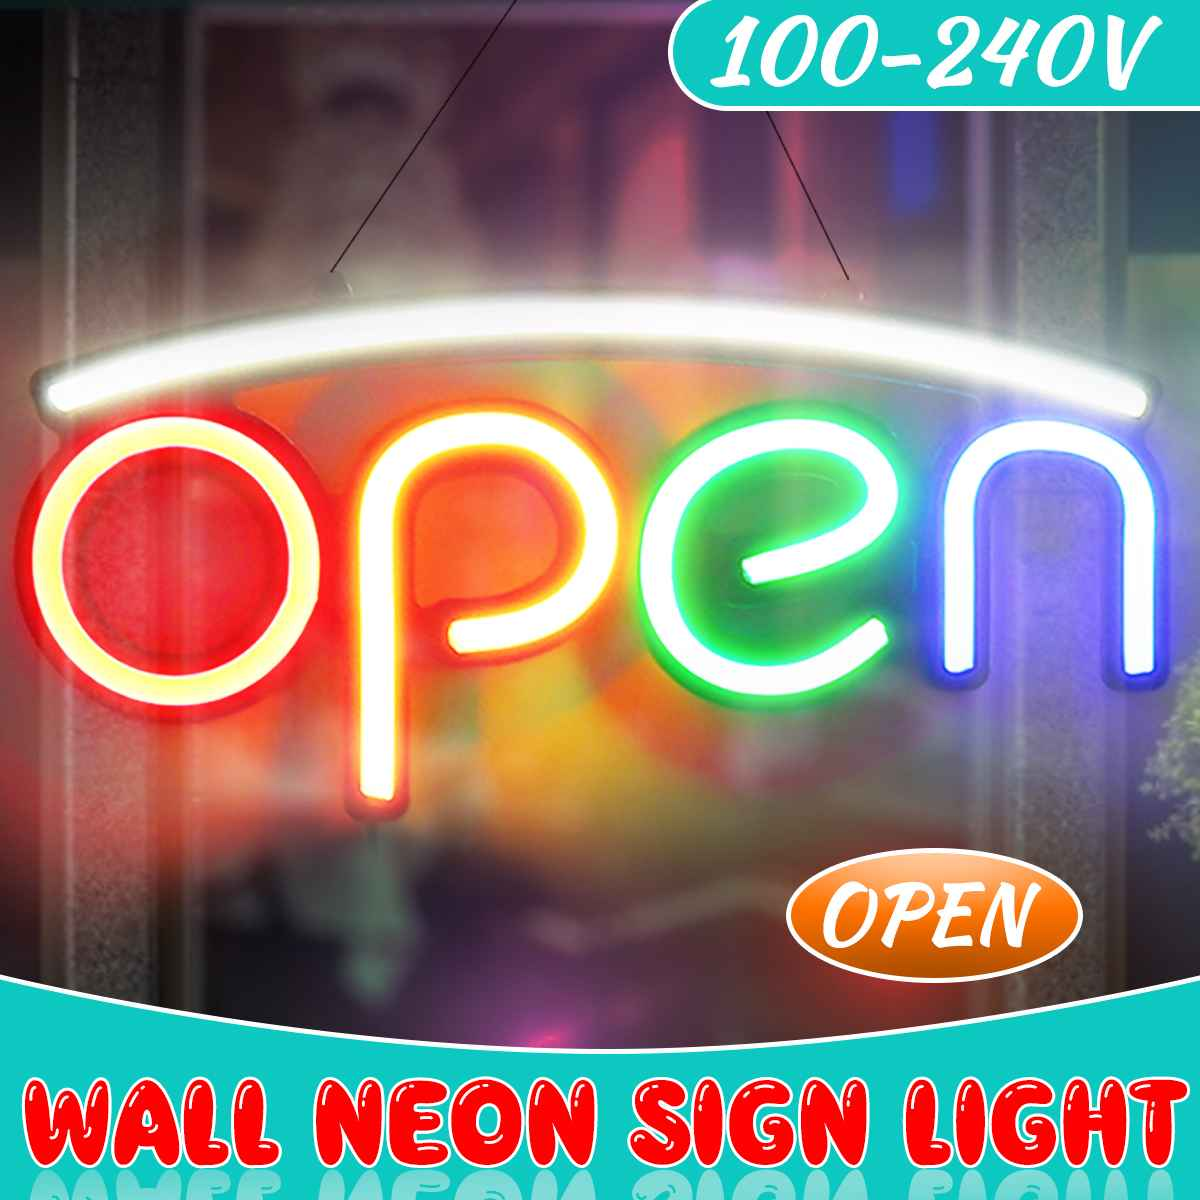 OPEN Neon Sign Light Bar Pub Party Night Light Wall Lamp Home Room Decoration Indoor Lighting Advertising Signs 100-240V EU Plug